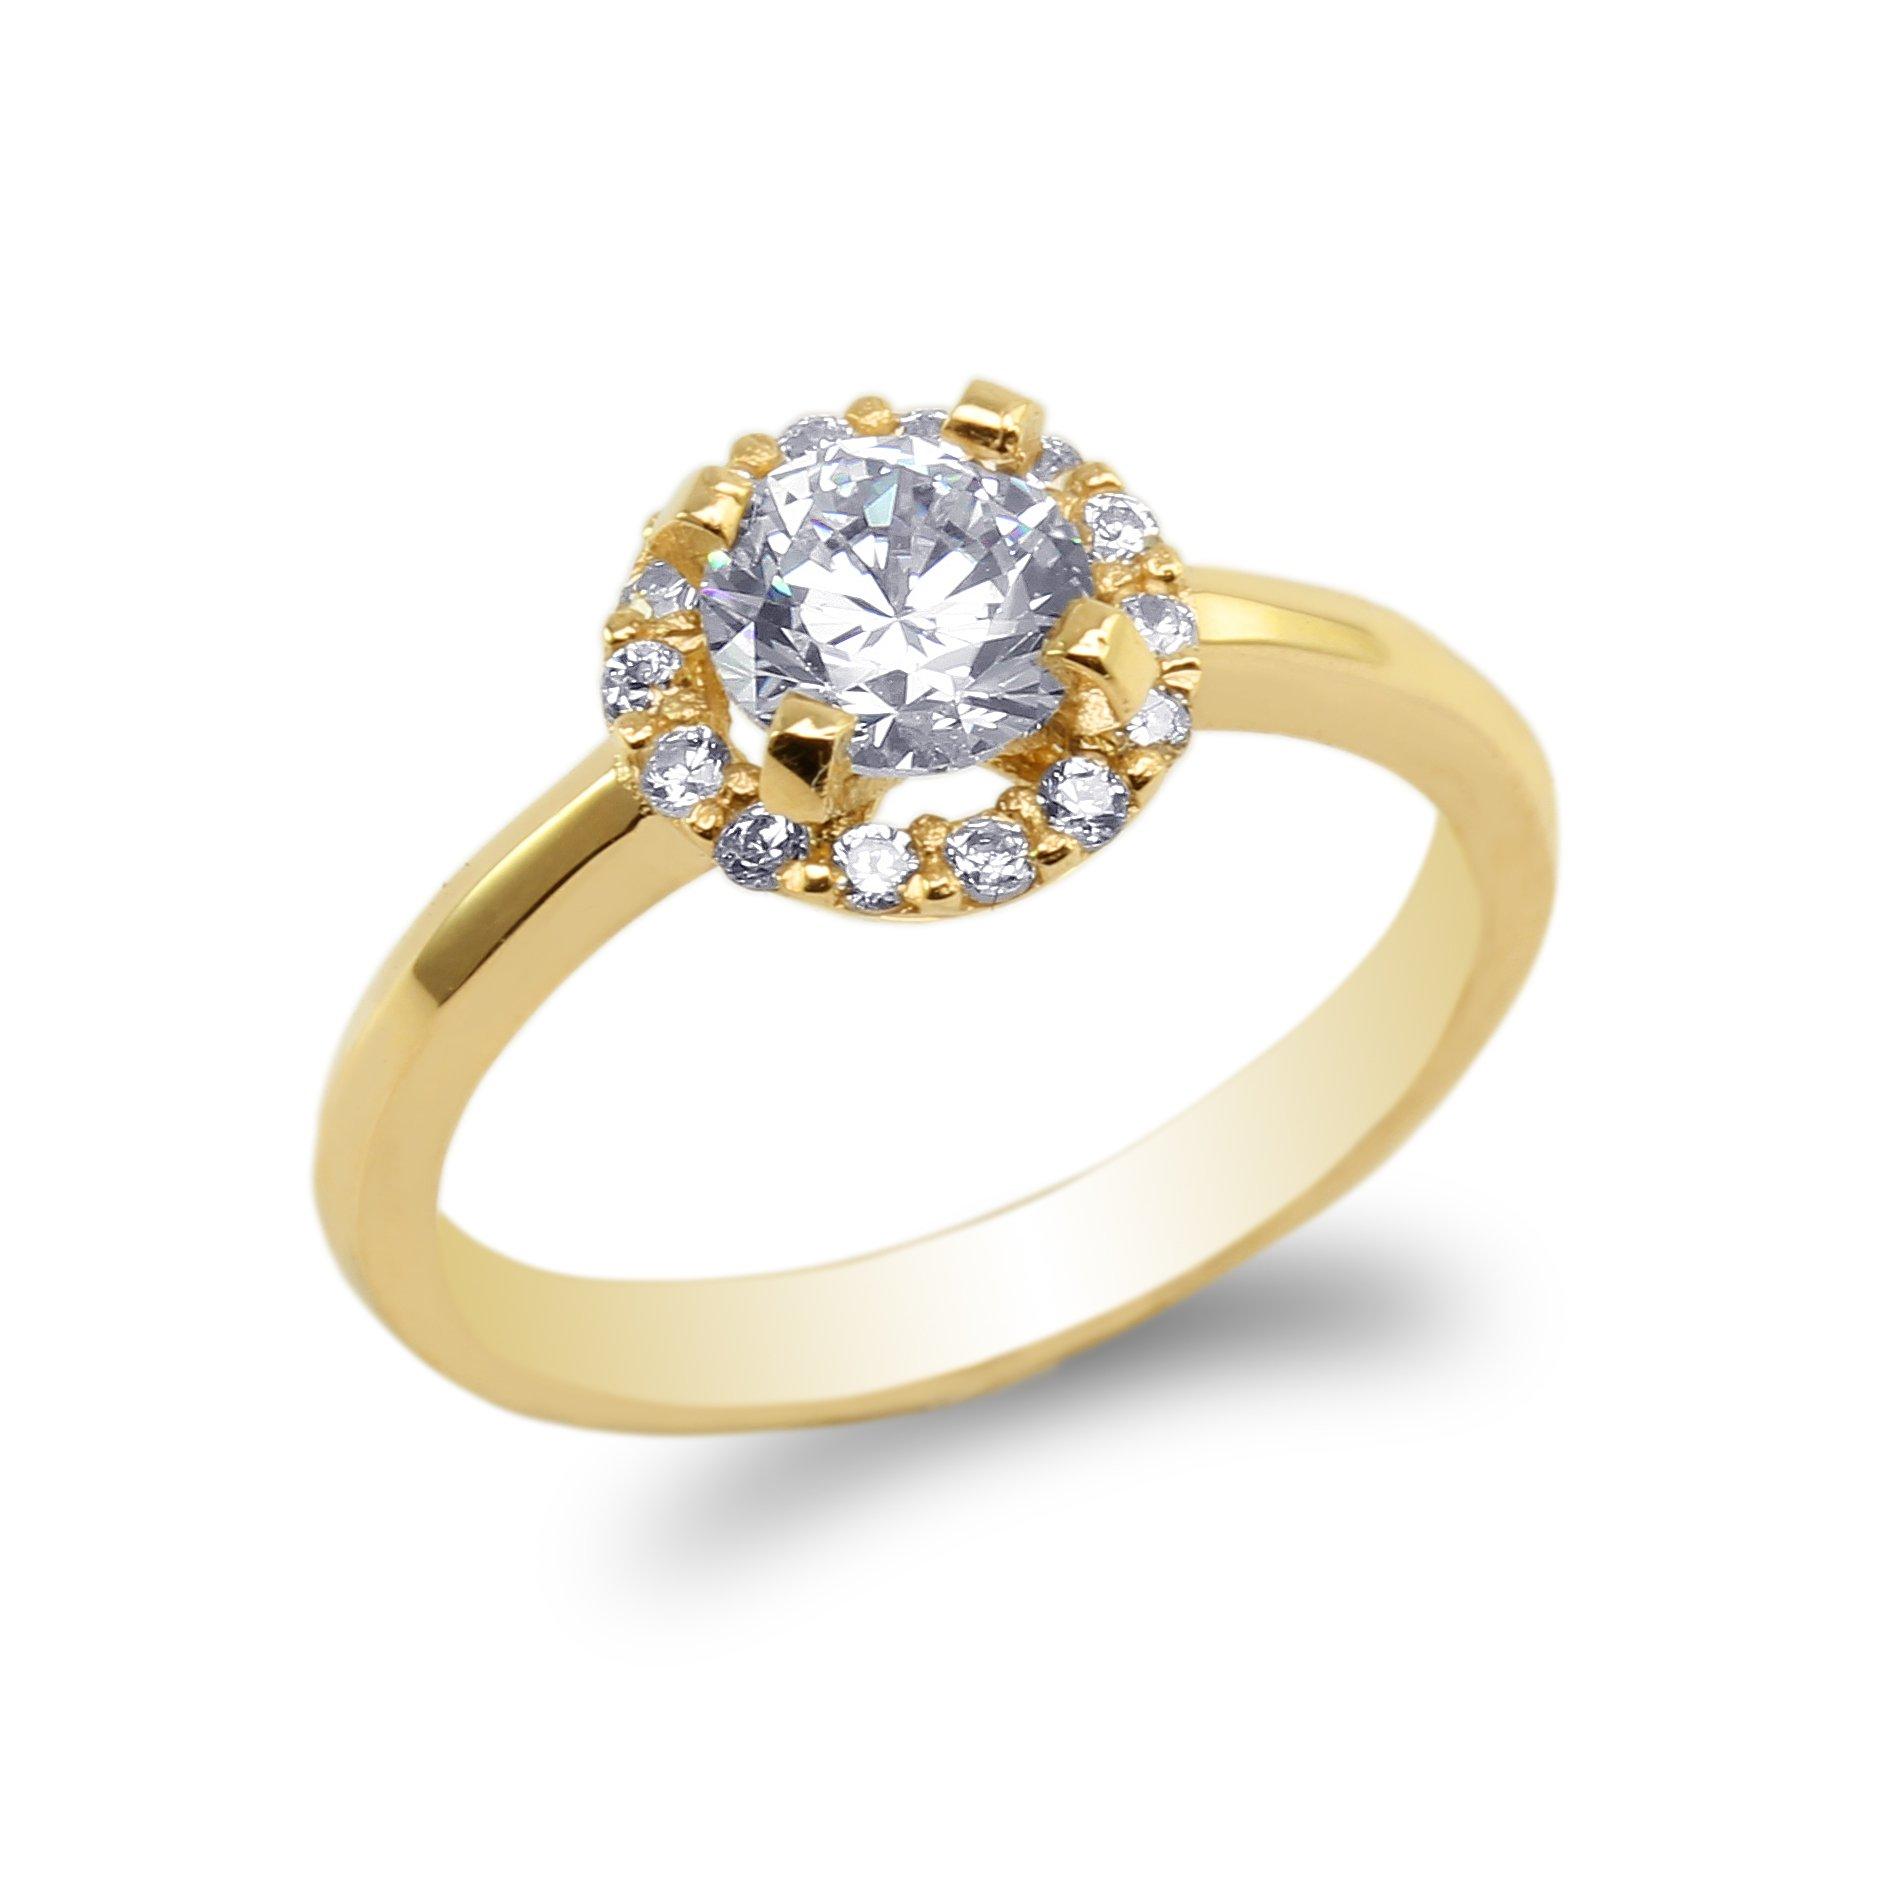 JamesJenny 10K Yellow Gold Halo Style Round CZ Ring Size 9.5